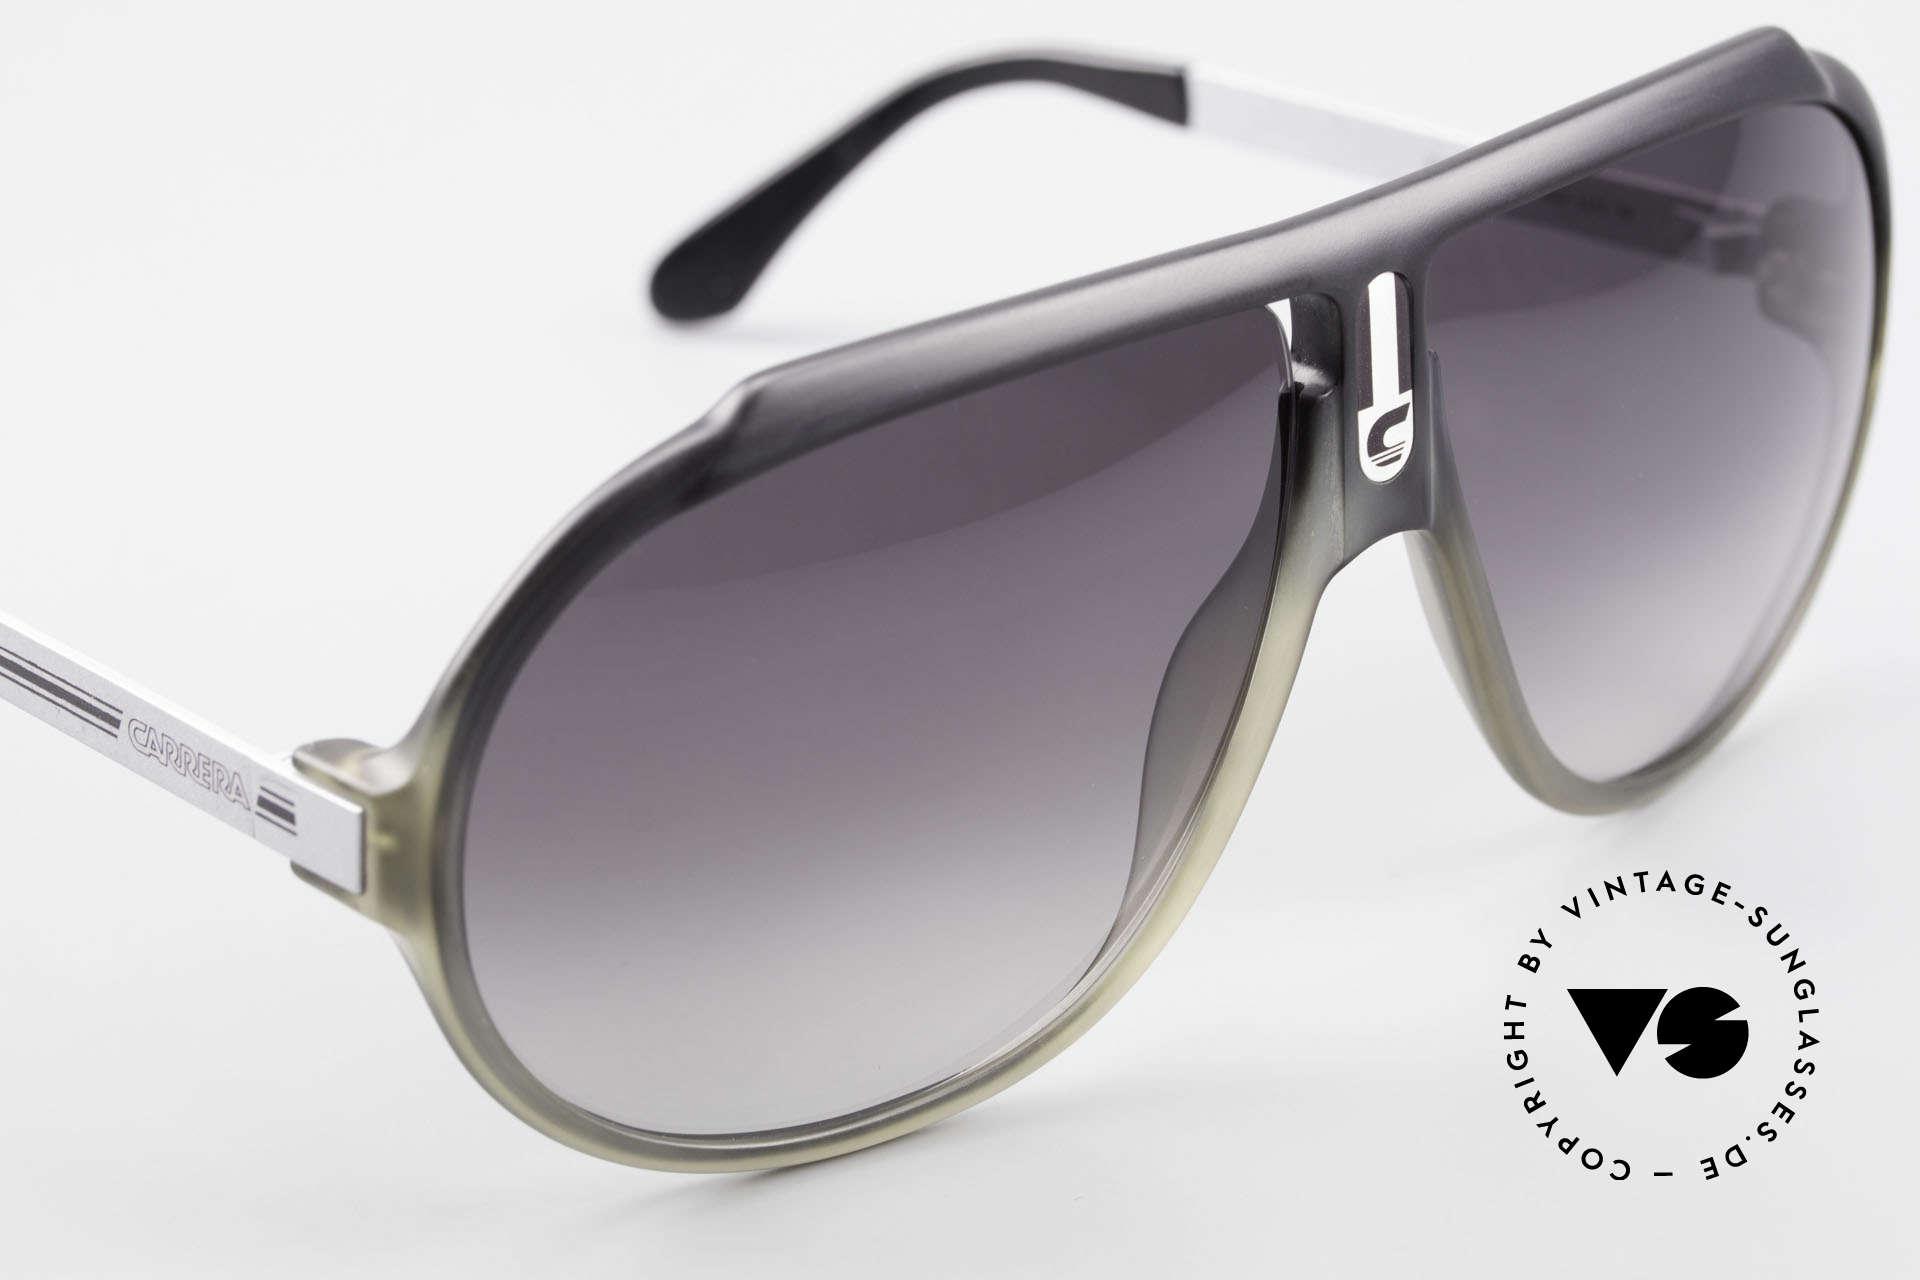 Carrera 5512 80's Miami Vice Sunglasses, unworn rarity with gray-gradient sun lenses (100% UV), Made for Men